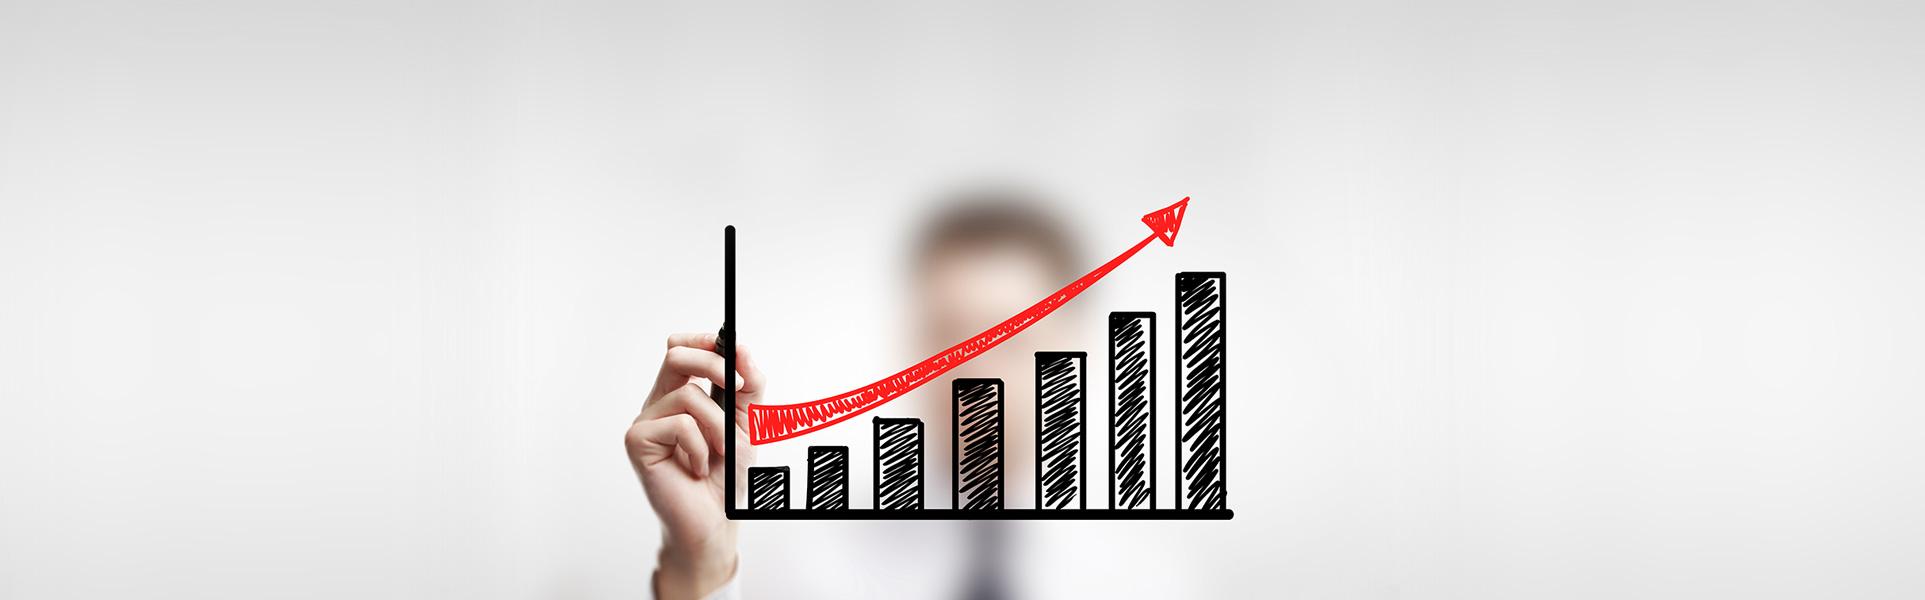 google-analytics-metrics-website-analysis-seo-advertising-eureka-california-humboldt-county